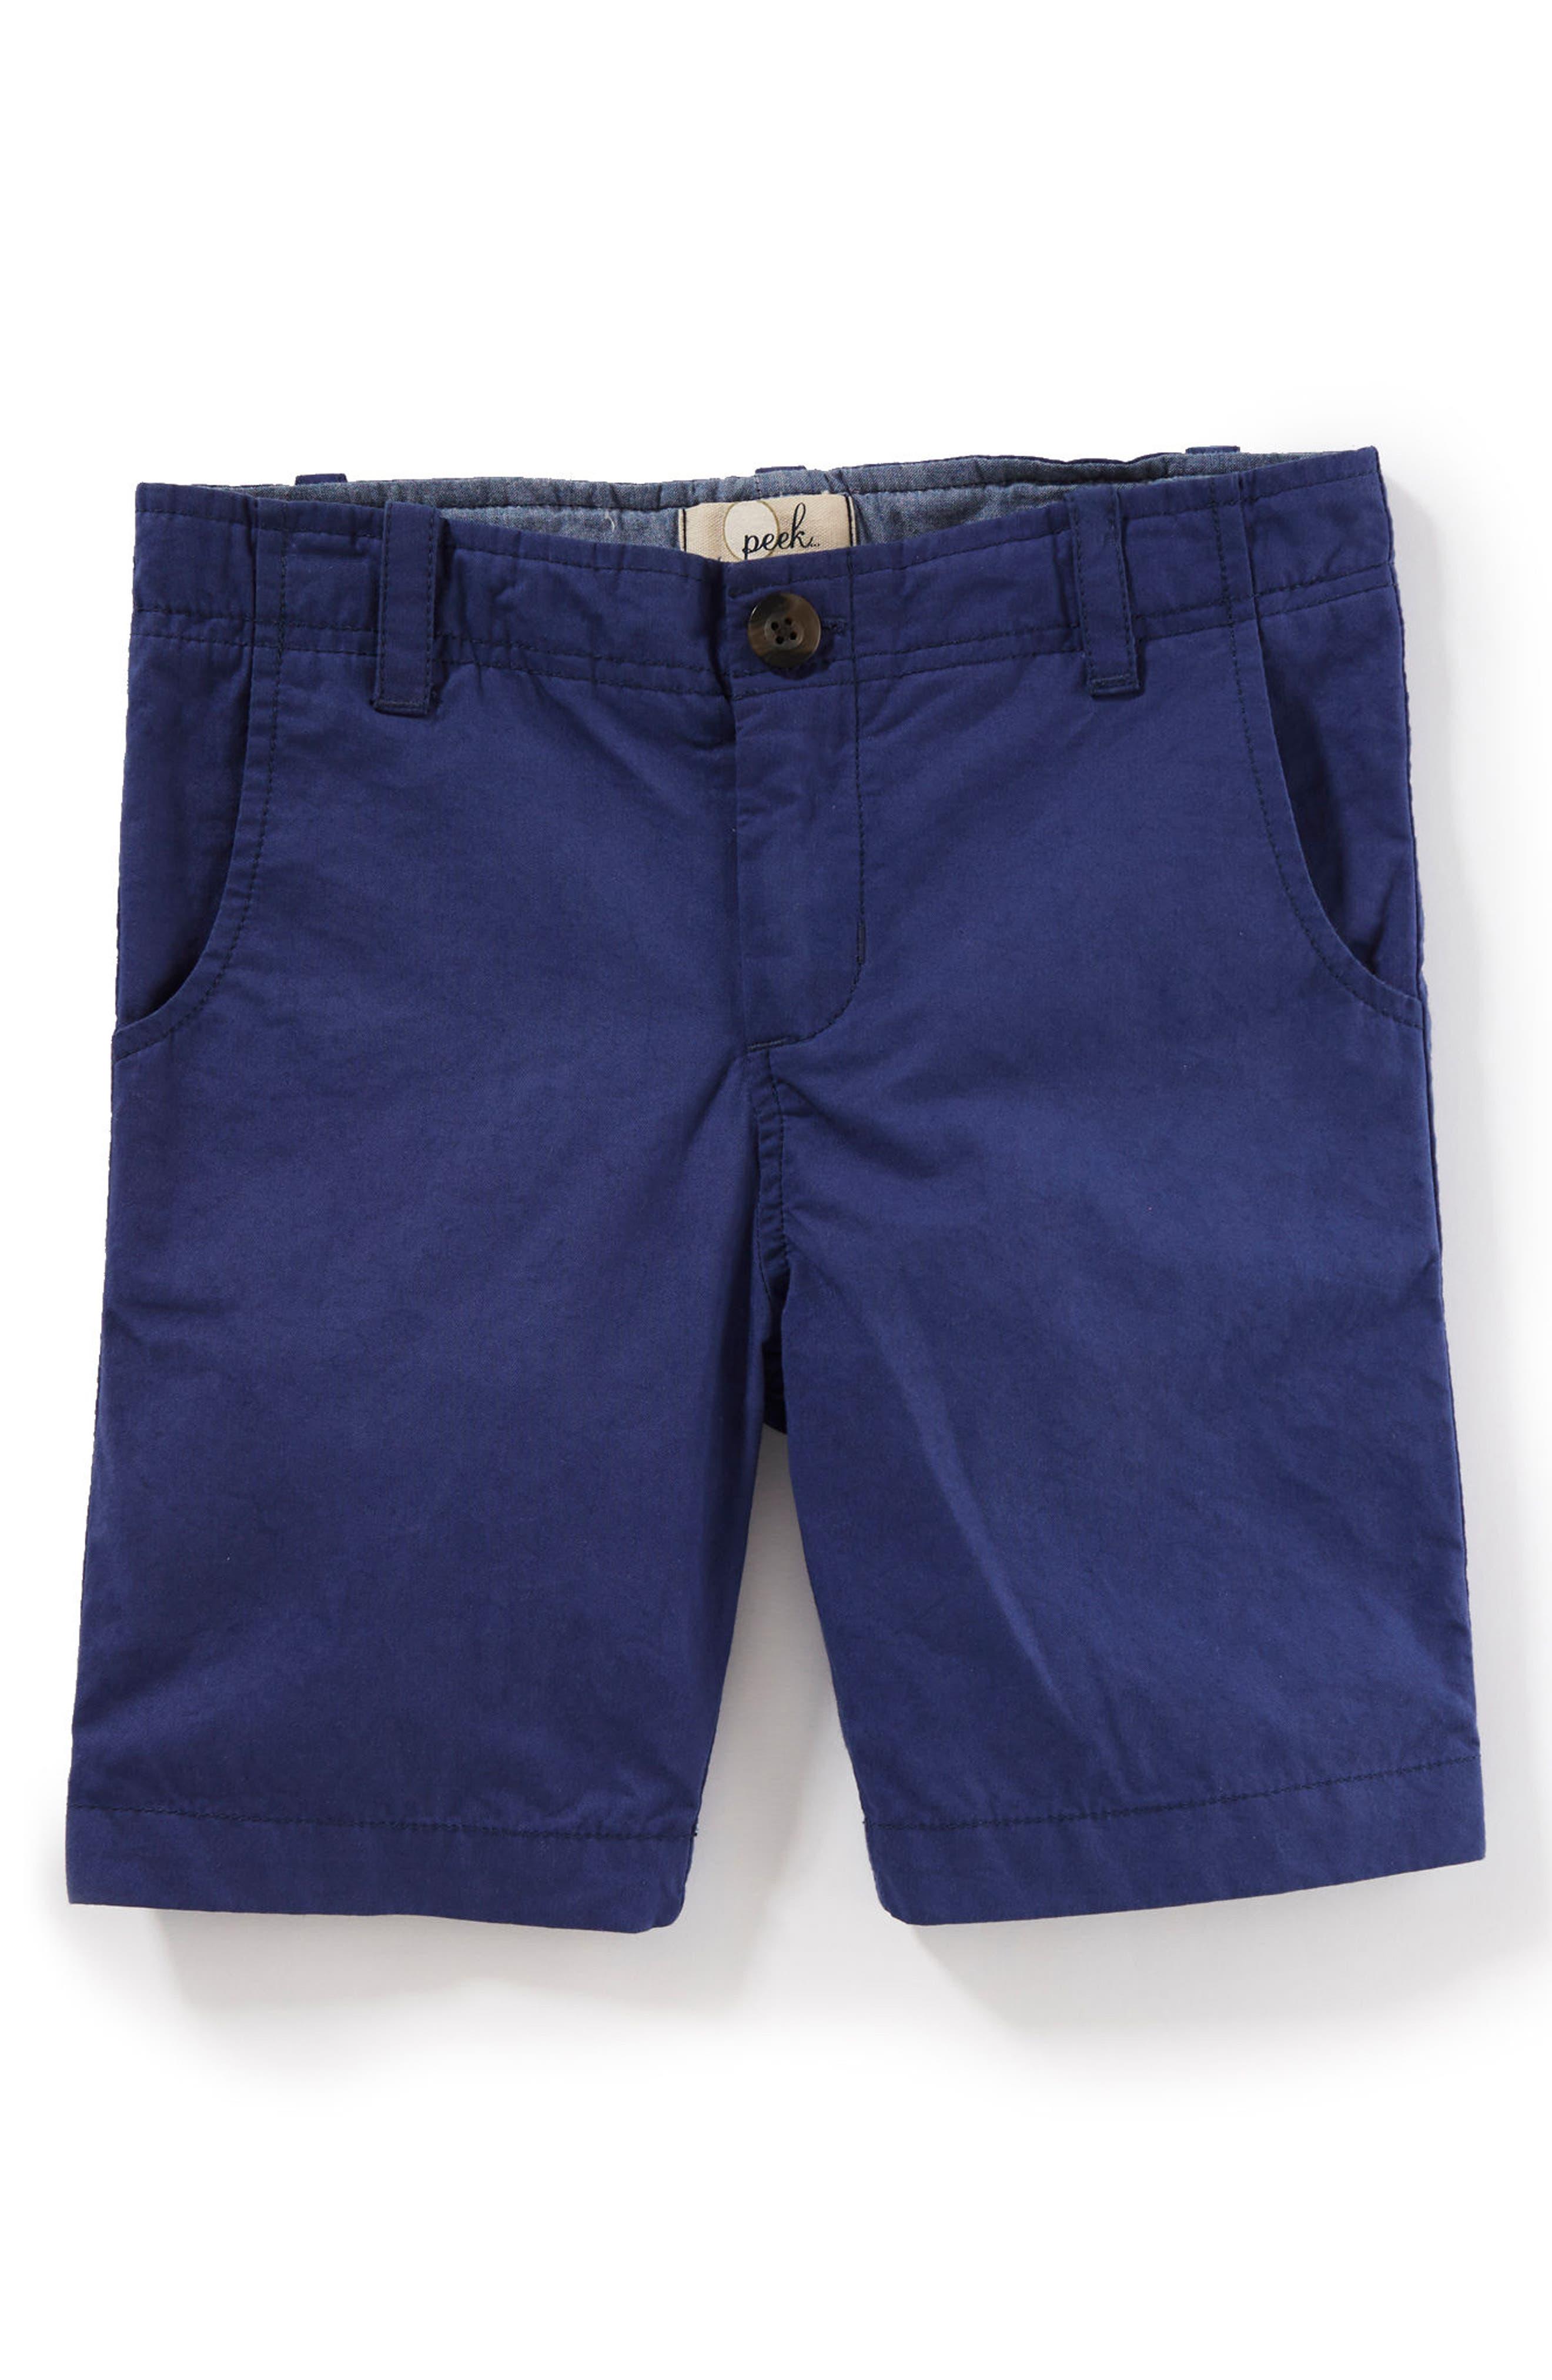 Hudson Shorts,                         Main,                         color, Blue